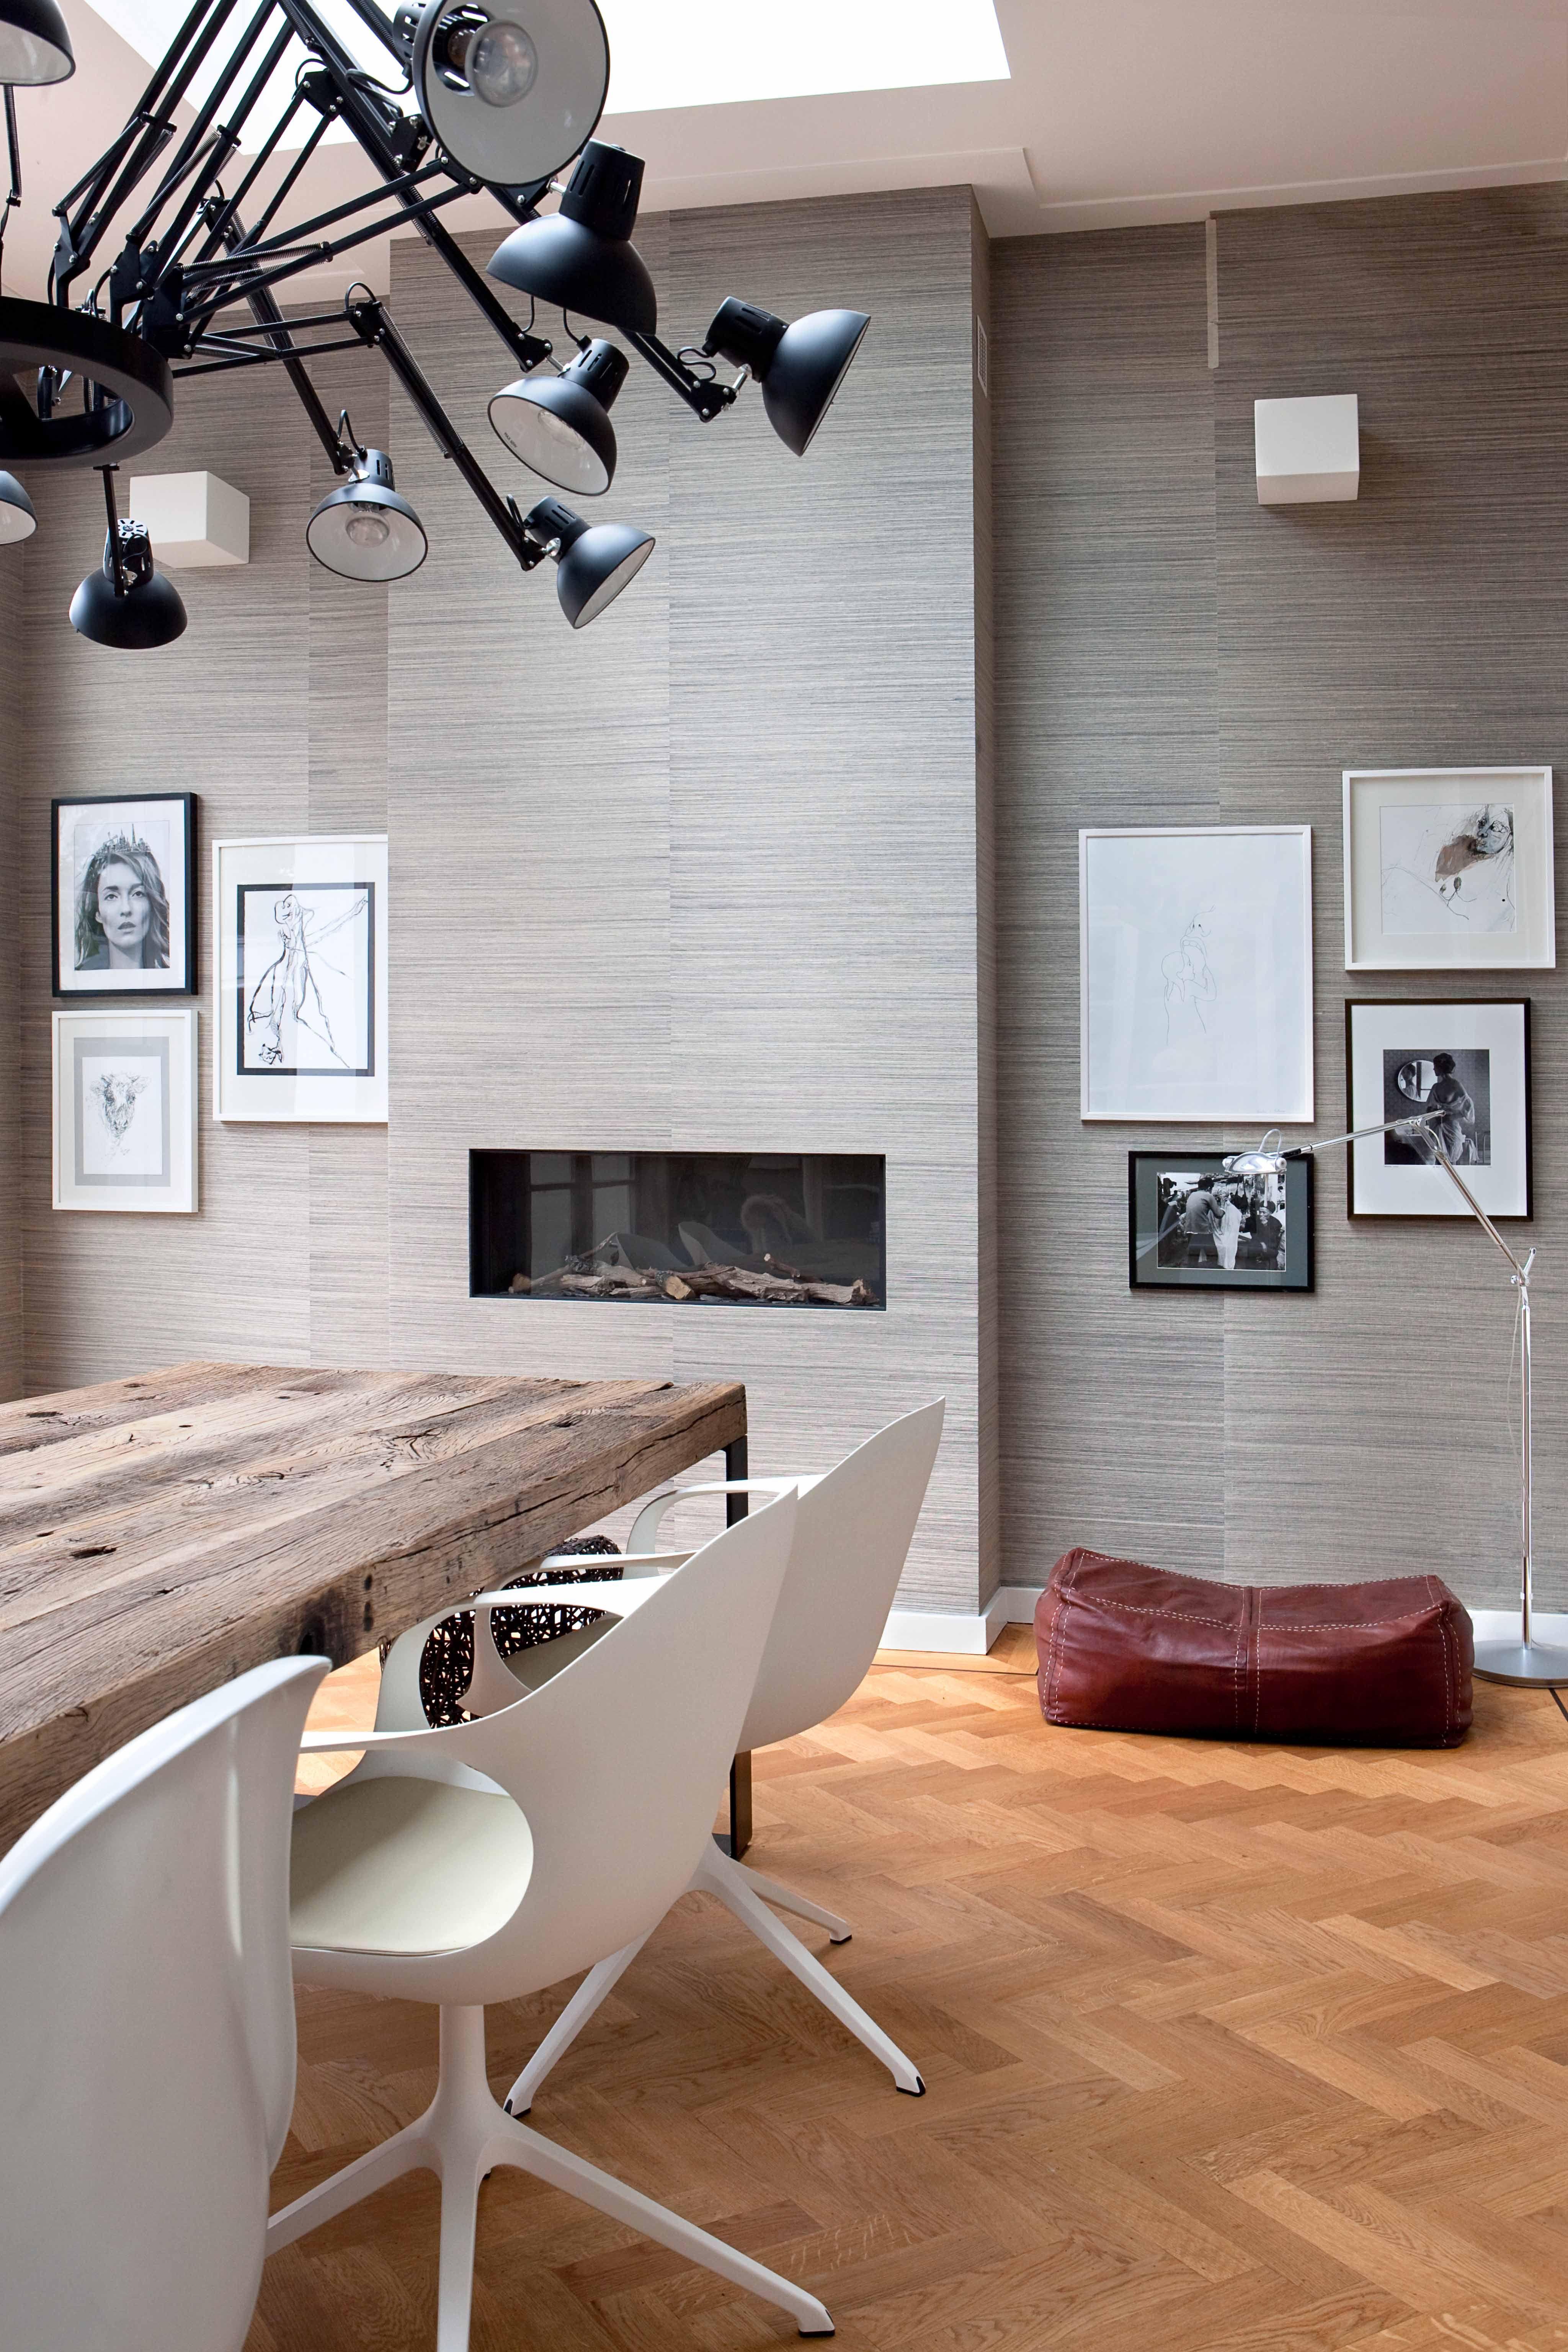 fireplace dining room interior design pinterest dining room rh pinterest com